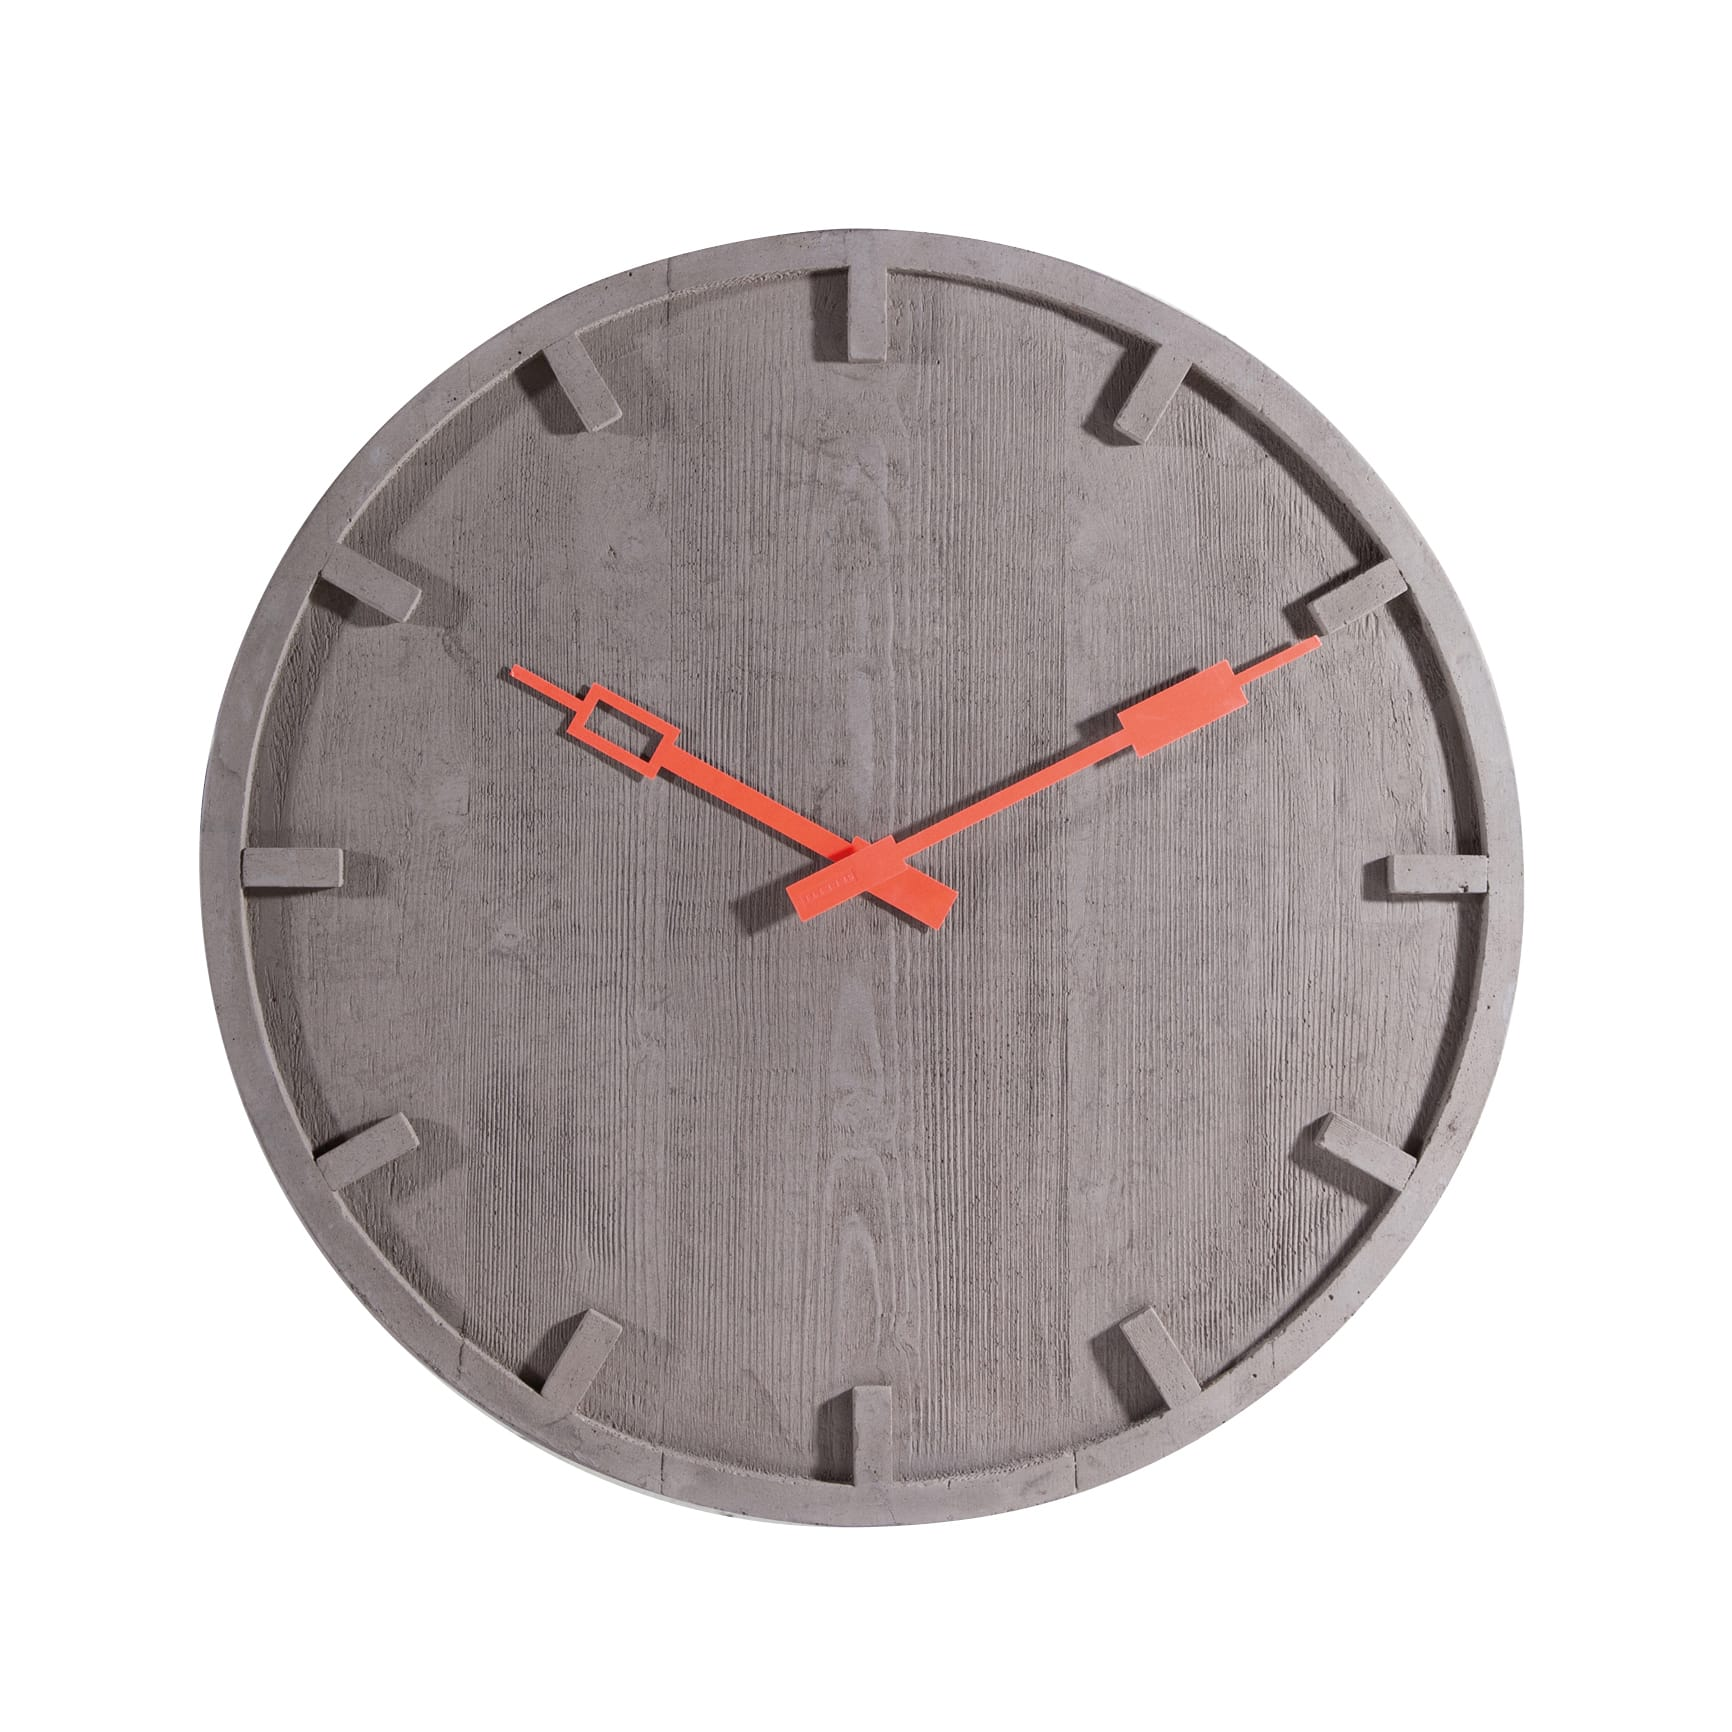 Memento cement clock modern intentions shop modern clocks memento cement clock designed by alessandro zambelli seletti amipublicfo Image collections